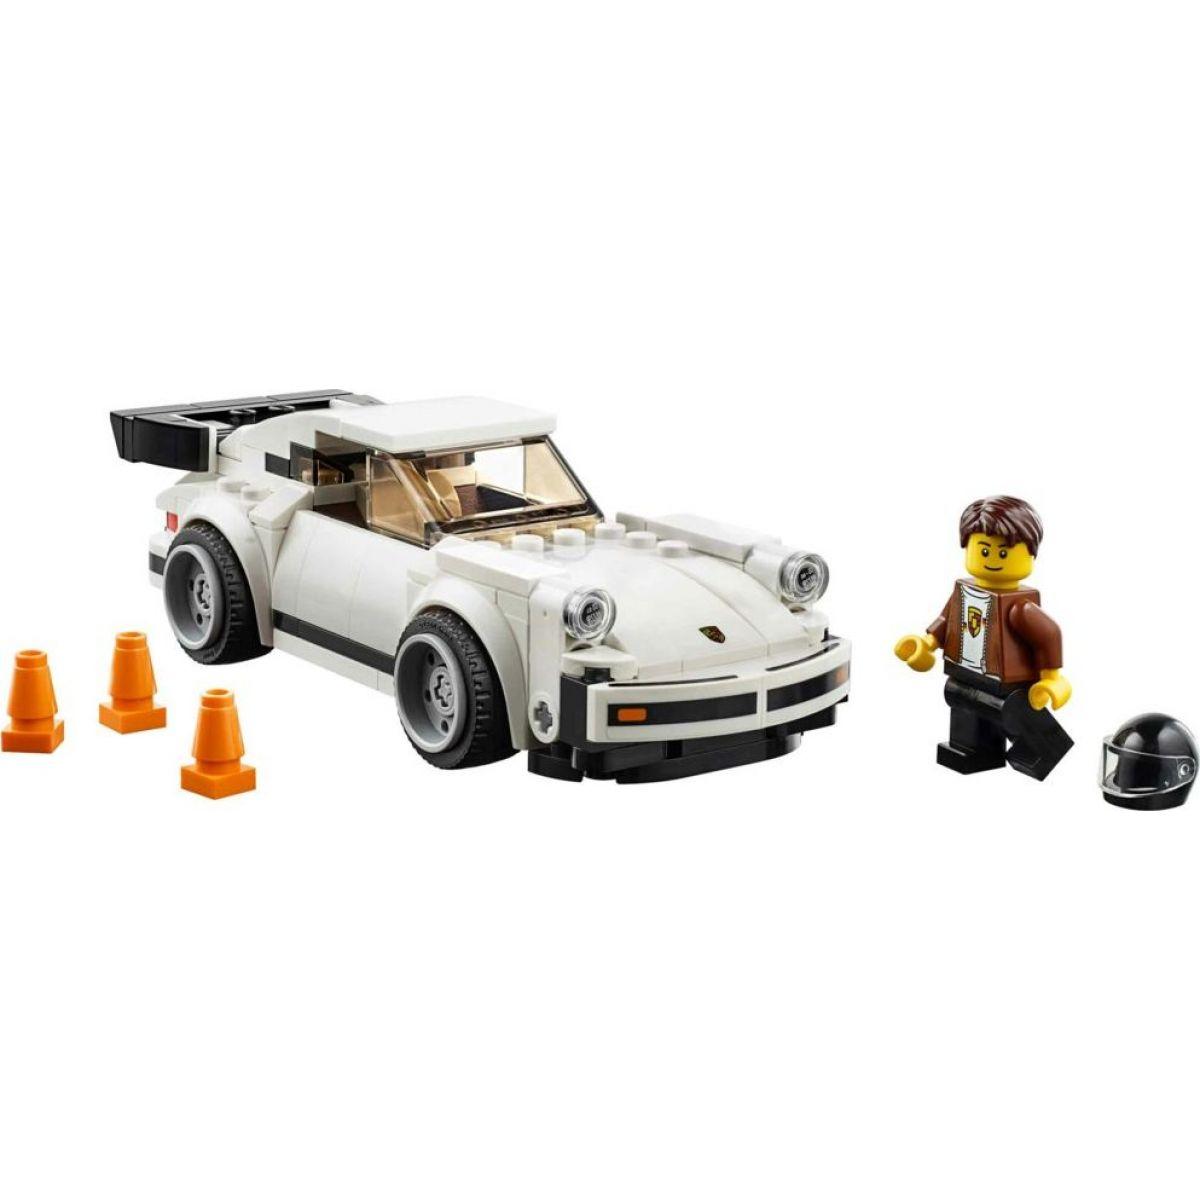 LEGO Speed Champions1974 75895 Porsche 911 Turbo 3.0